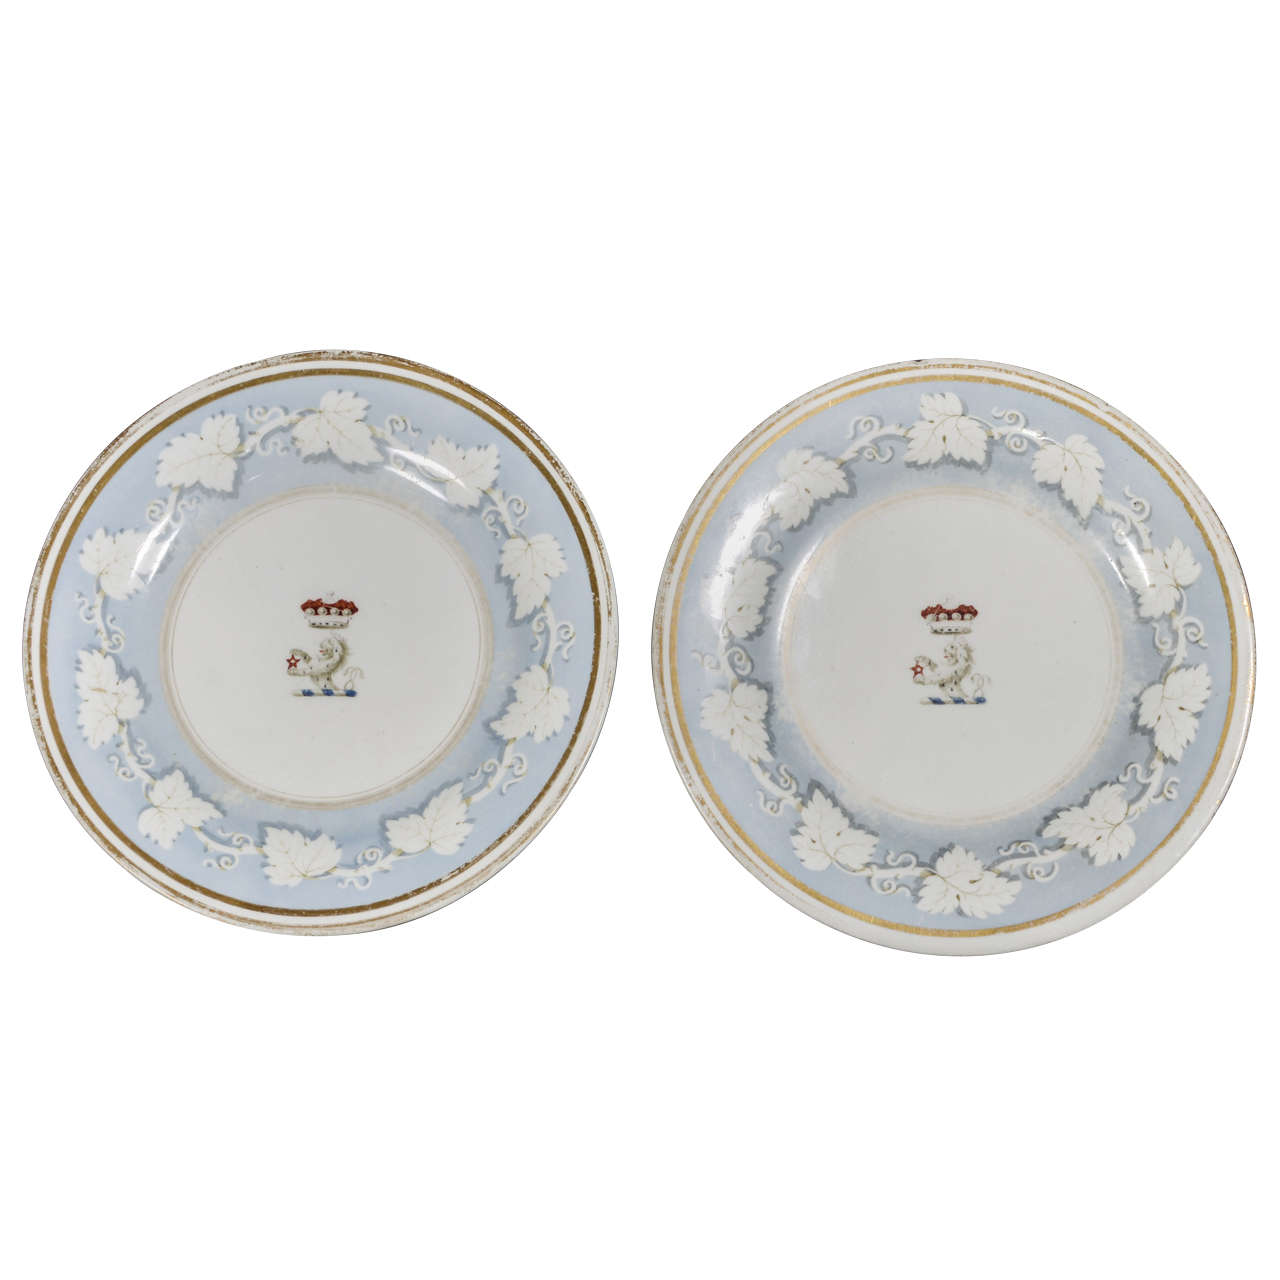 Pair of Flight, Barr & Barr Plates - Worcester Porcelain